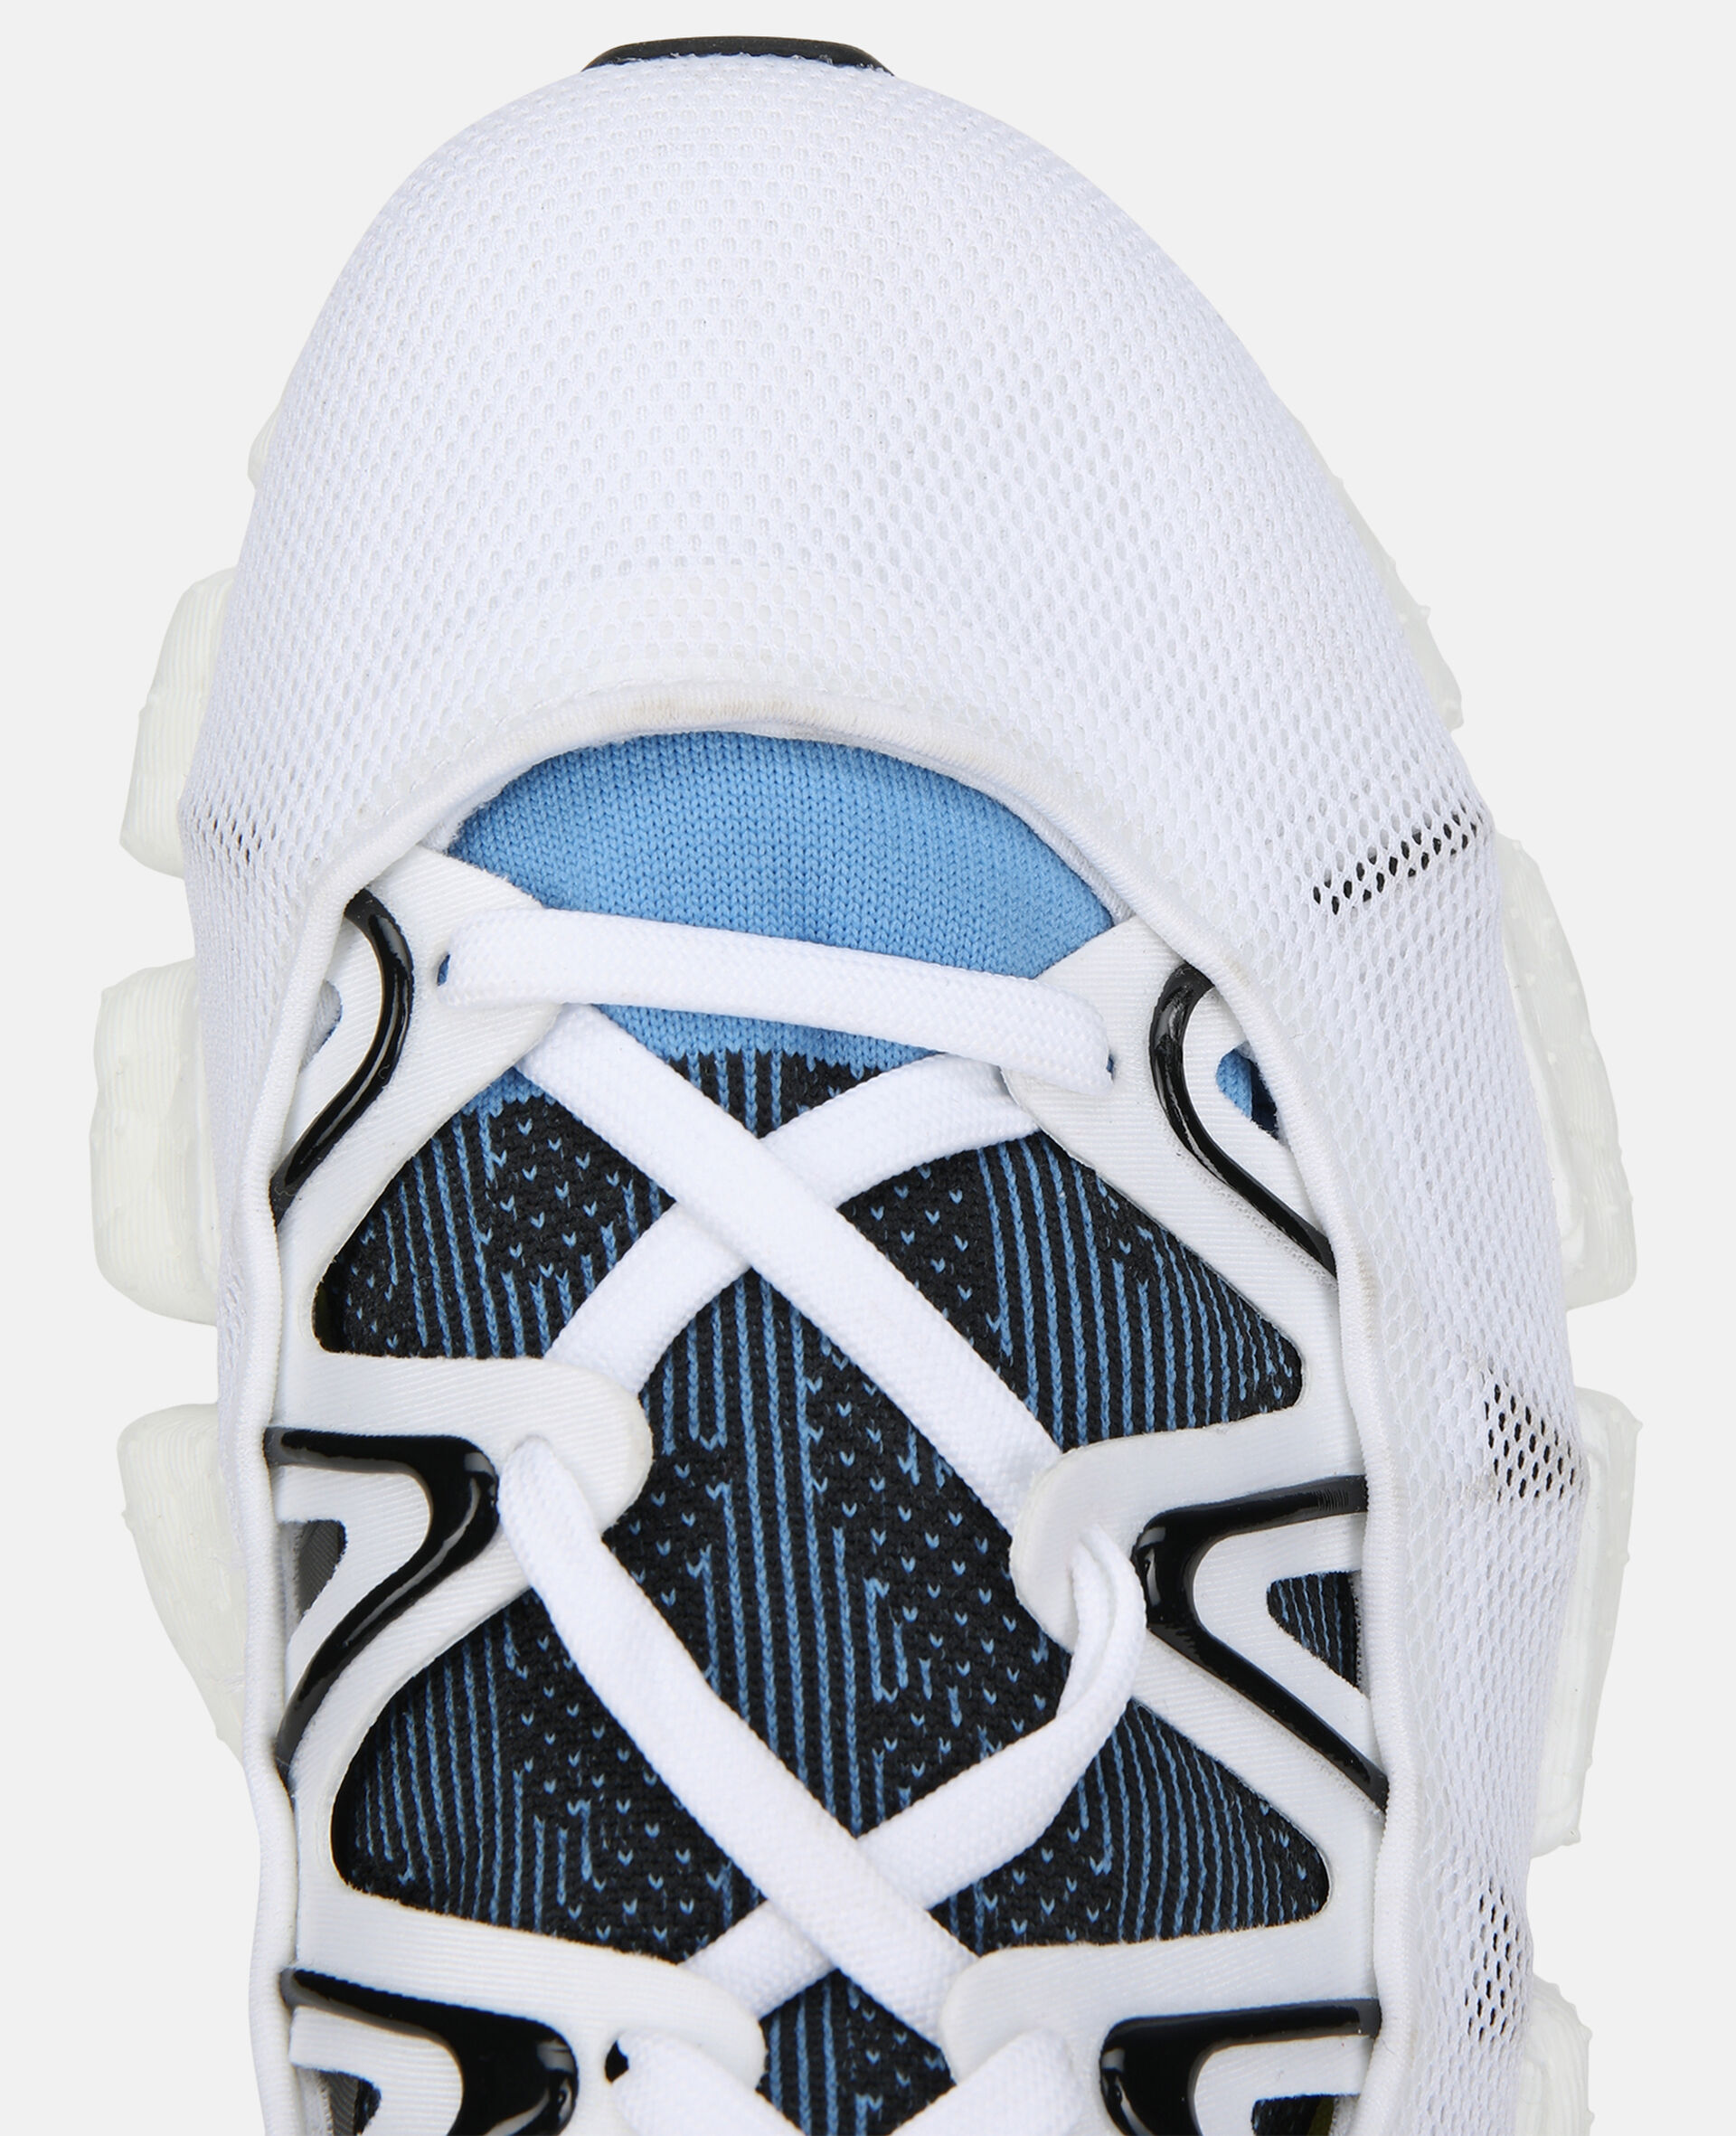 ClimaCool Vento 三合一运动鞋 -白色-large image number 3